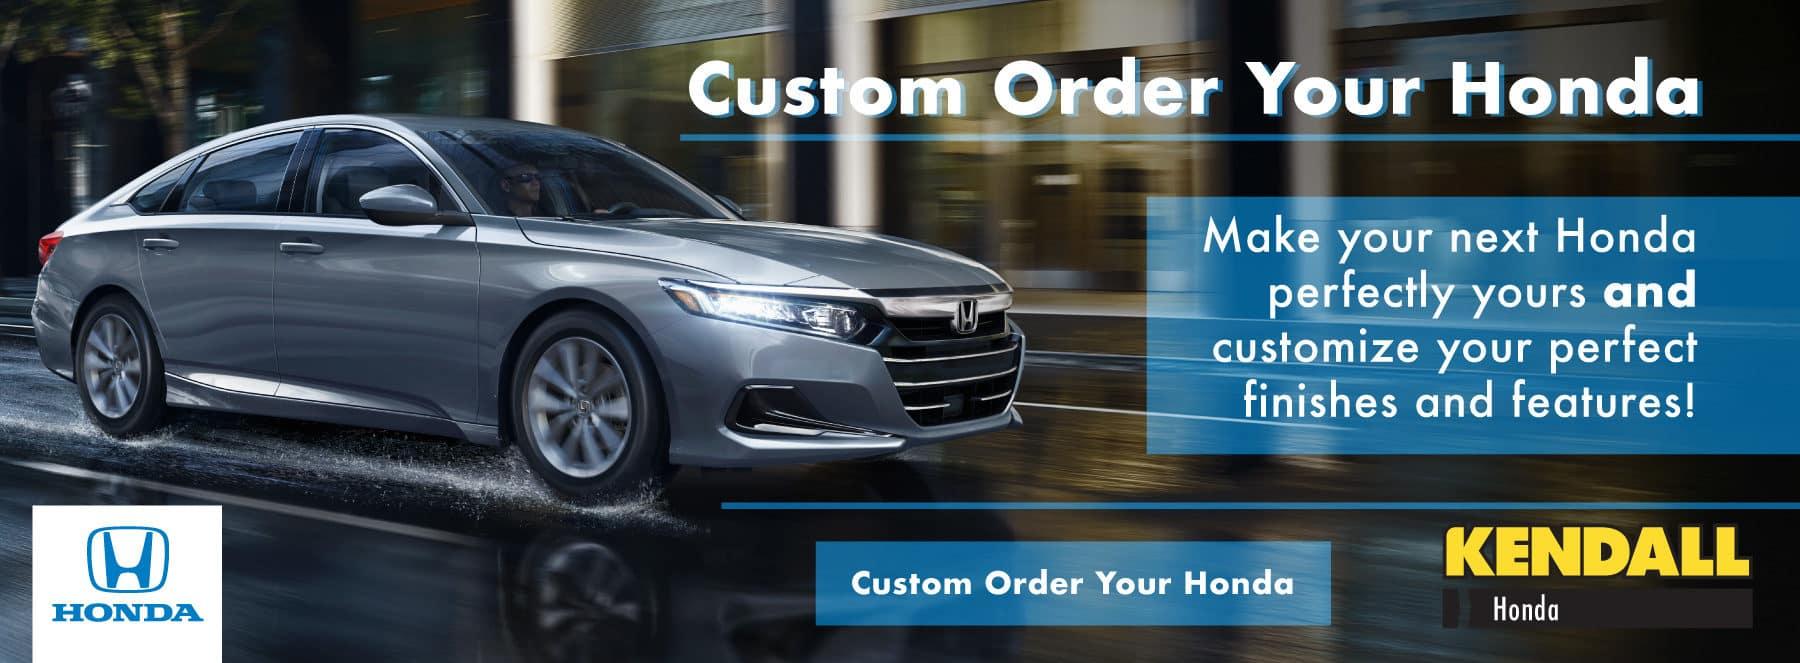 17960-KenAut-Sep21-Custom-Order-Vehicle-Web-Banners-HONDA-EUGENE